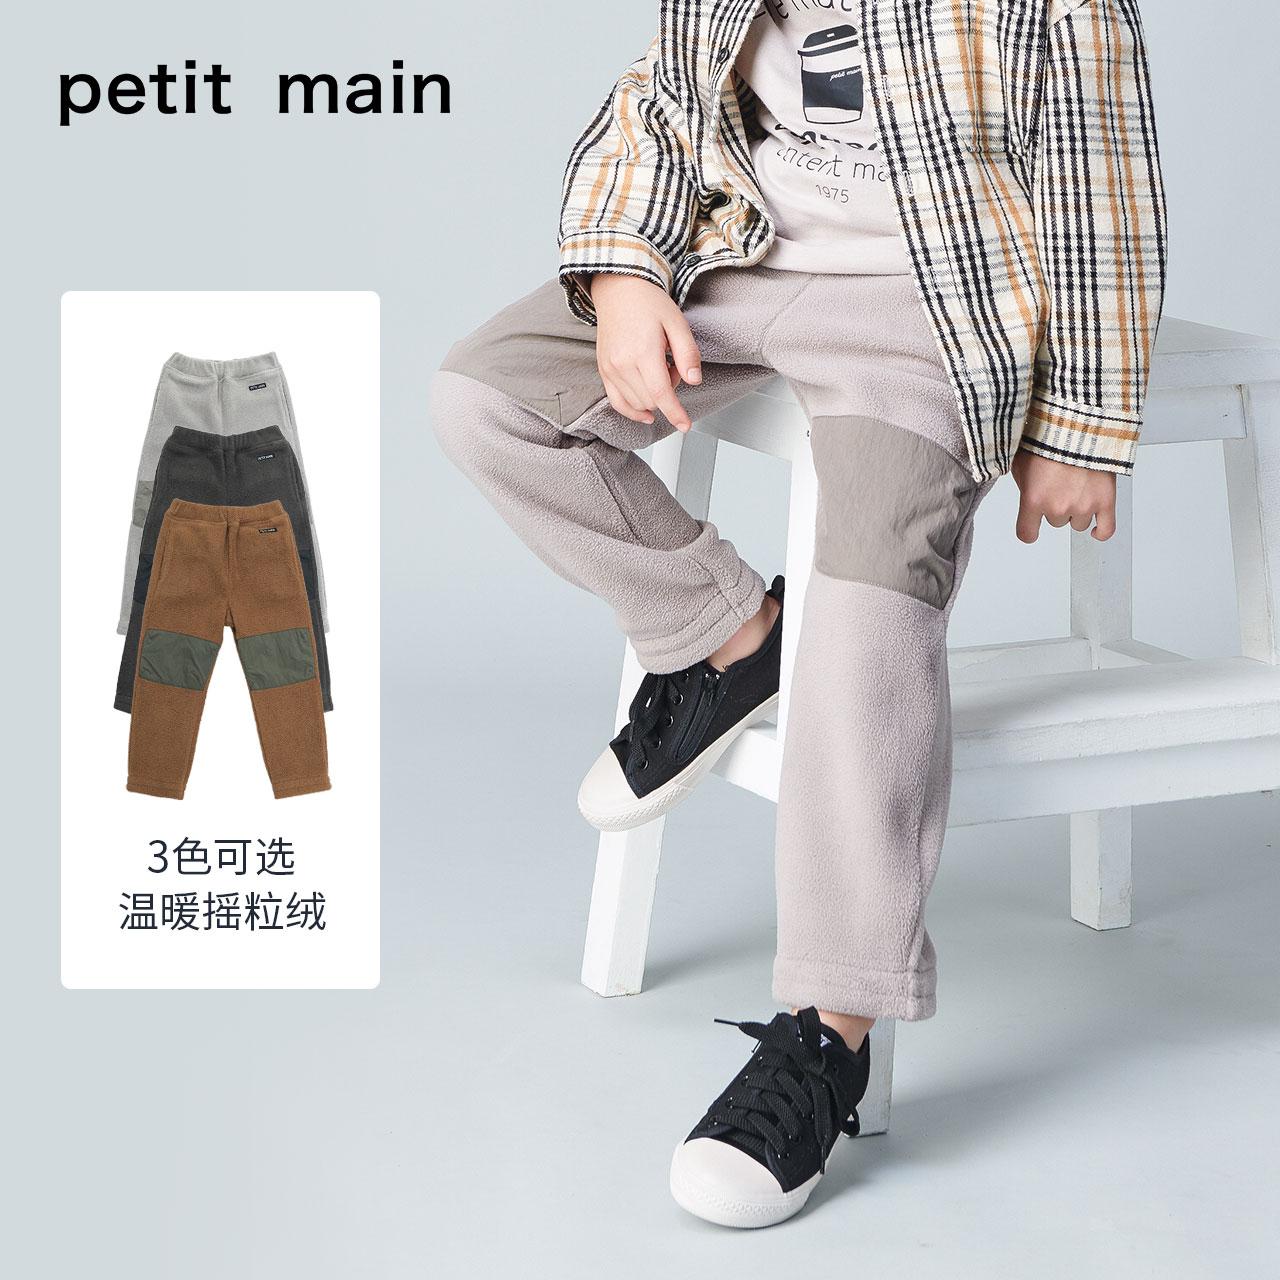 petitmain童装旗舰店 petitmain童装摇粒绒儿童男童裤子 券后79元包邮